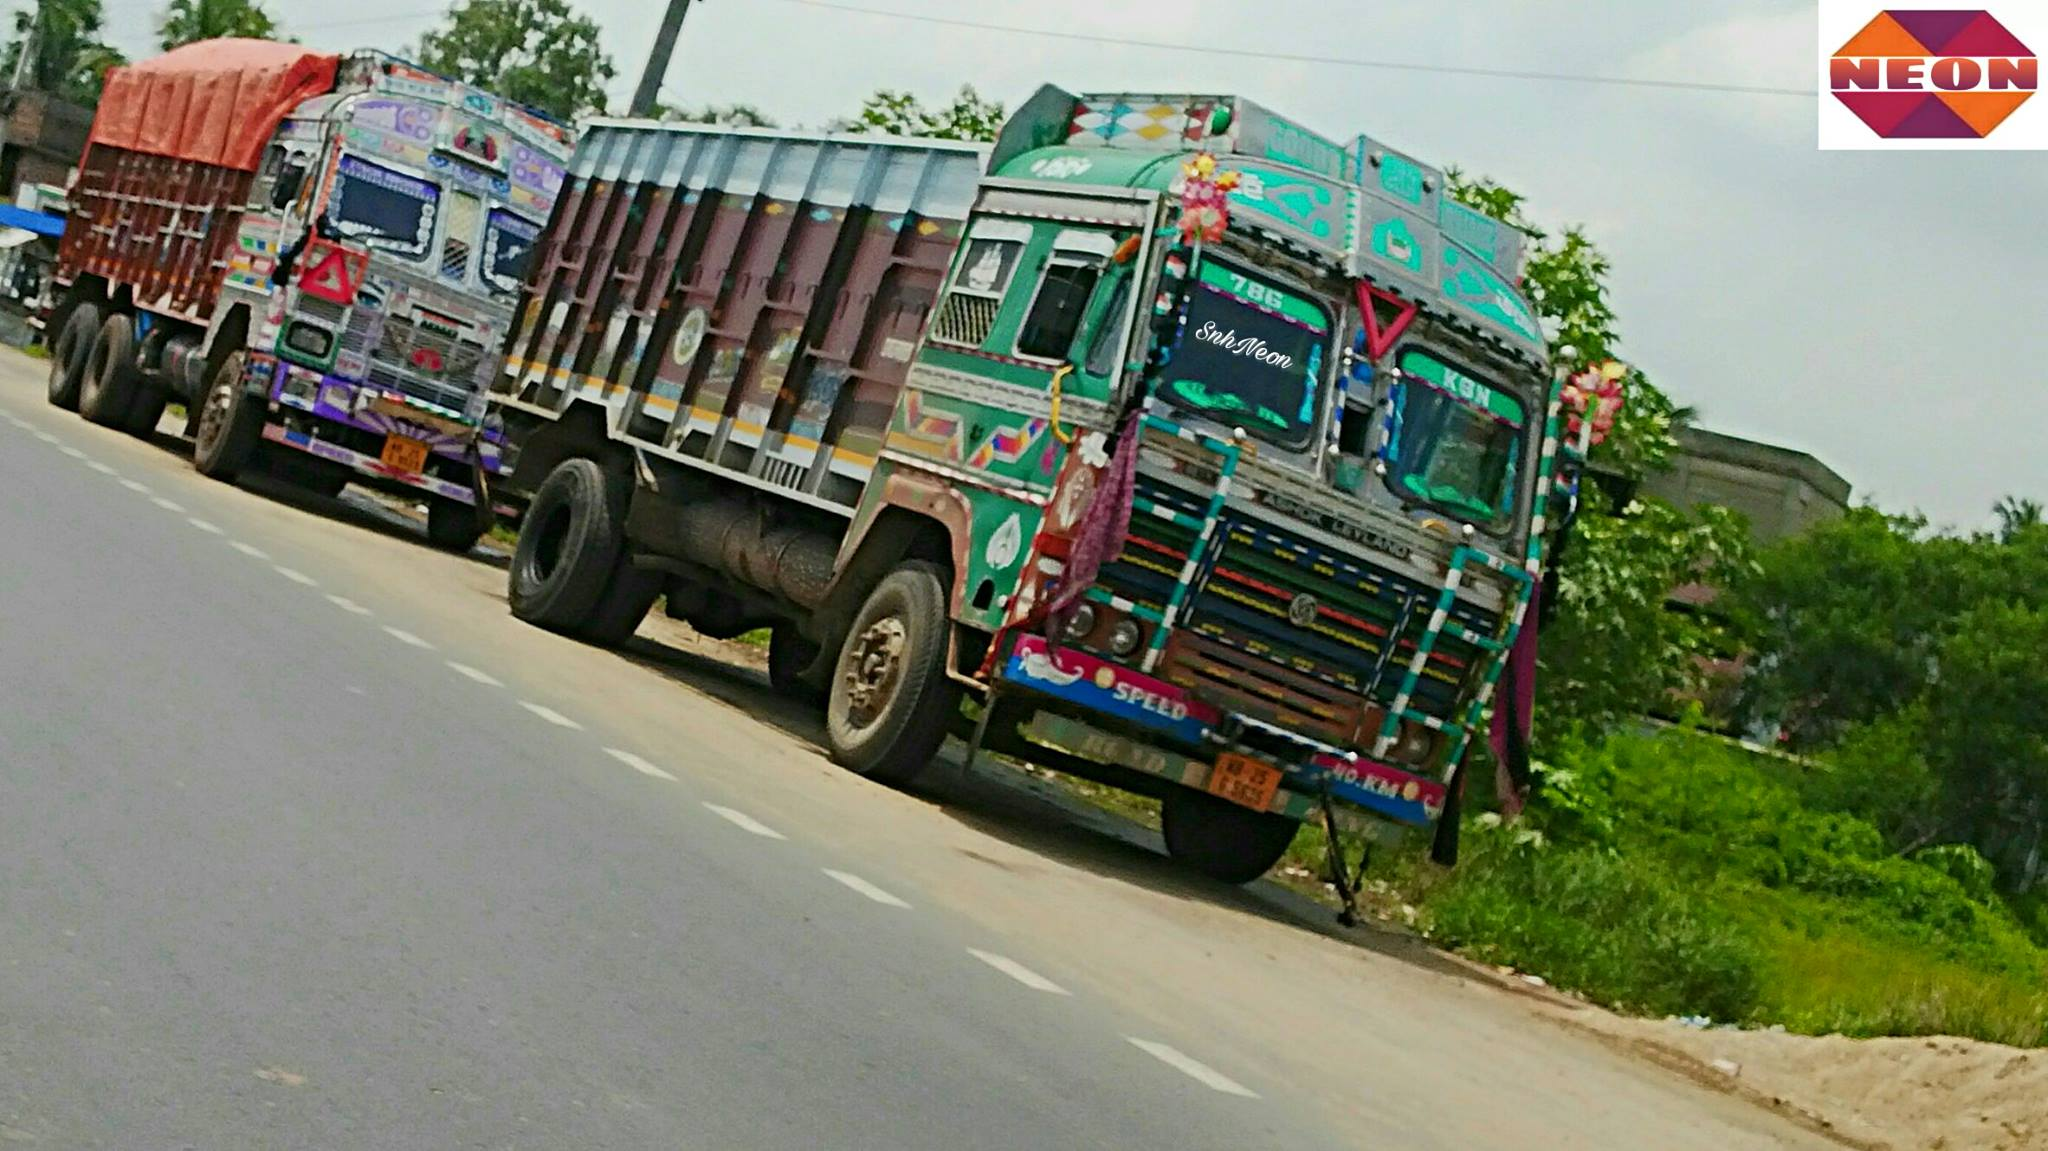 Ashok-Leyland-1616il-open-truck-Tata-2518c-open-truck-CHAMPADANGA-DANKUNI-ROAD-HOOGHLY--WEST-BENGAL-INDIA-